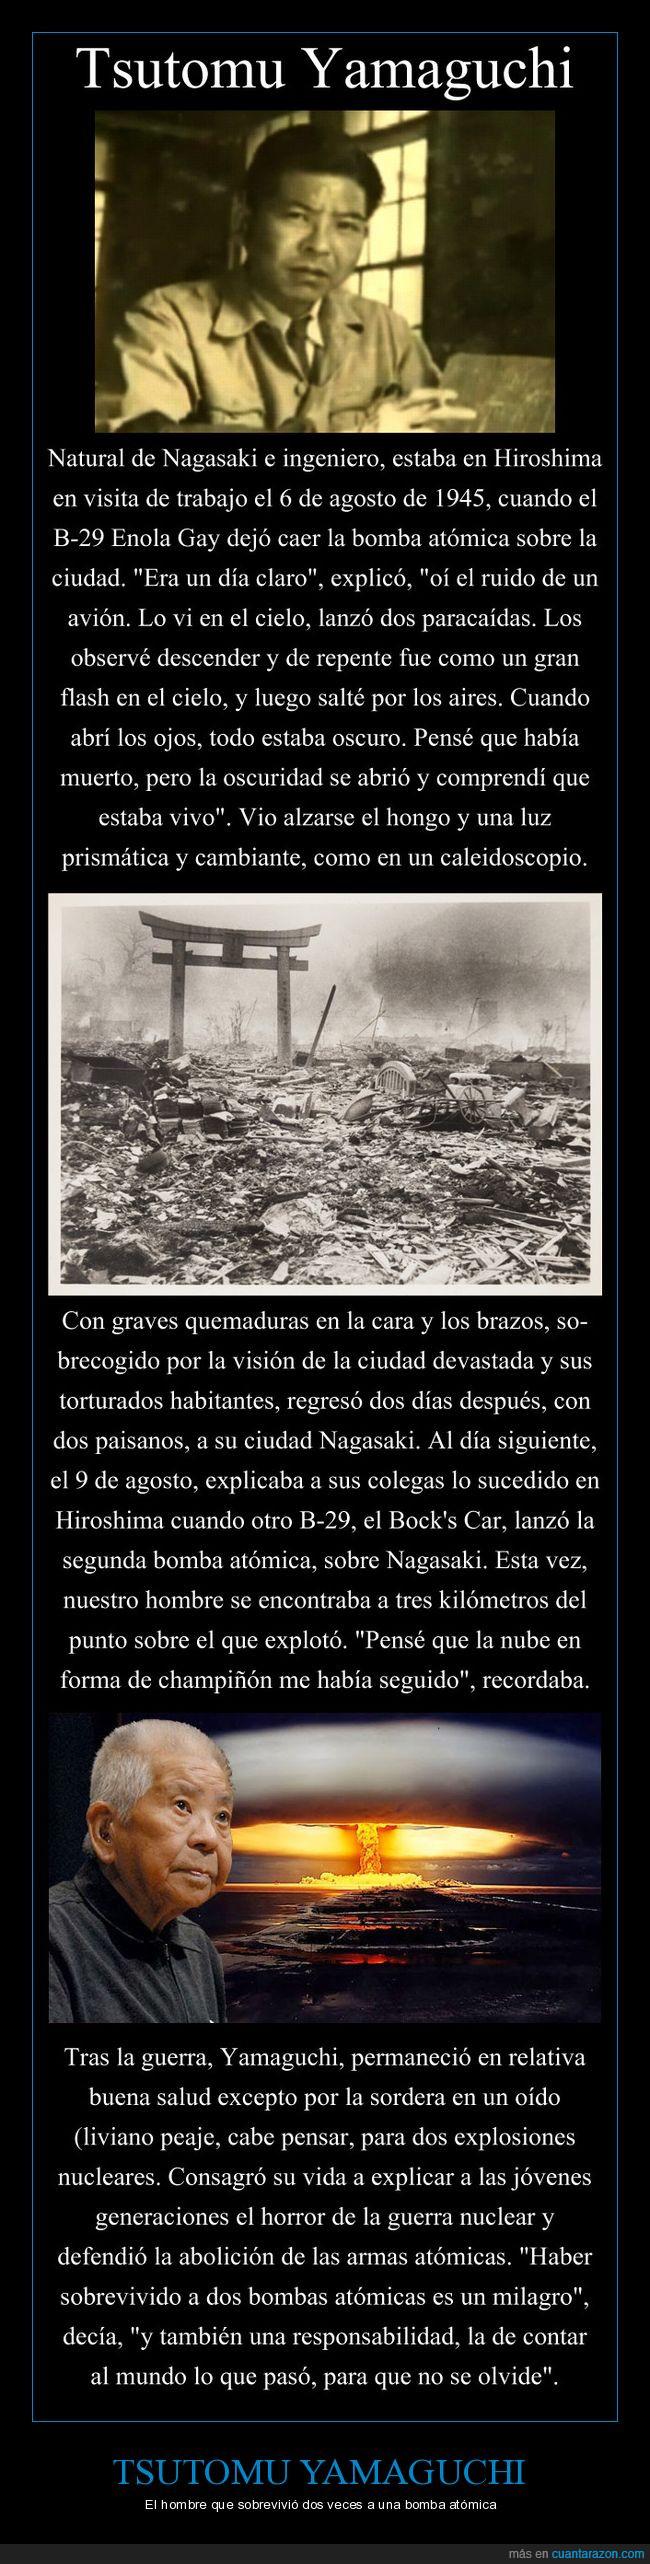 atómicas,Bombas,Hiroshima,Nagasaki,Tsutomu Yamaguchi